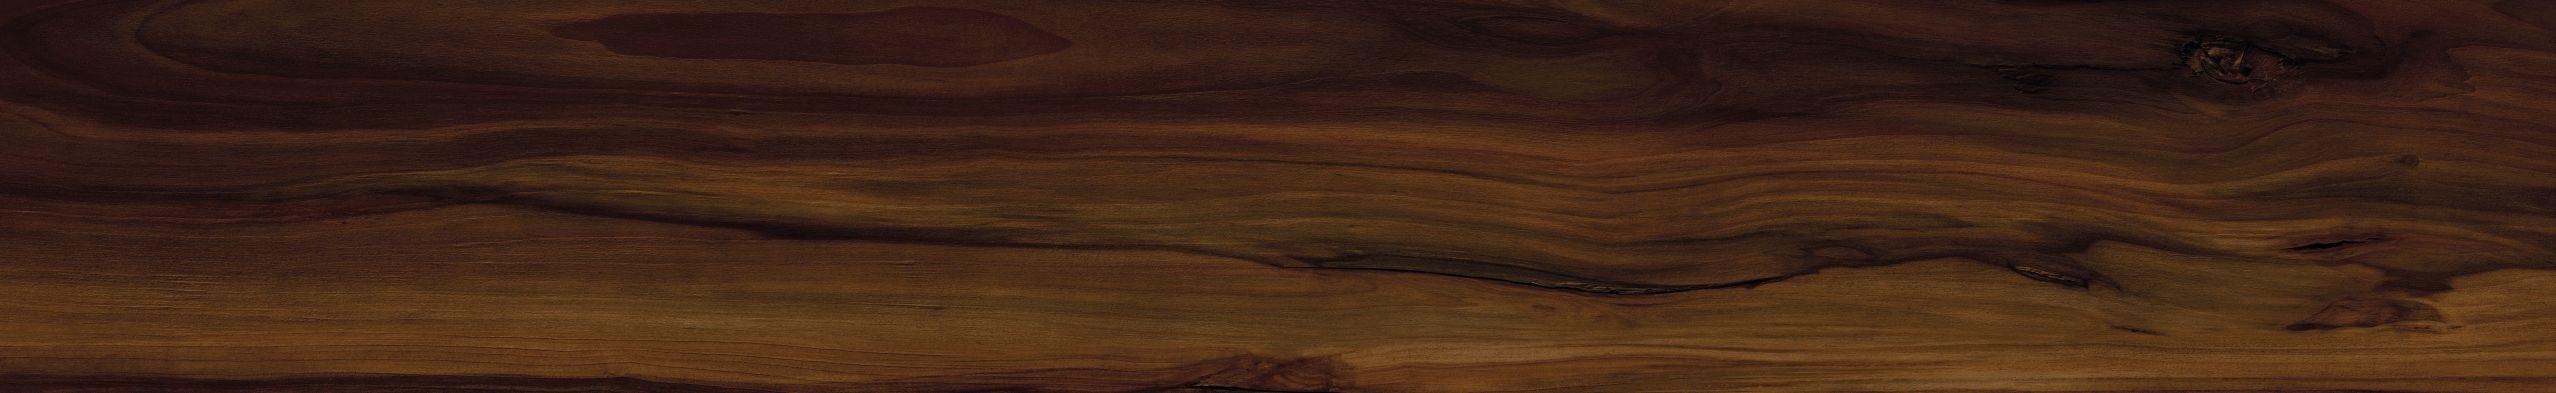 Panele winylowe LVT modulari ® WOOD DRYBACK 19,6 x 132 cm 20870